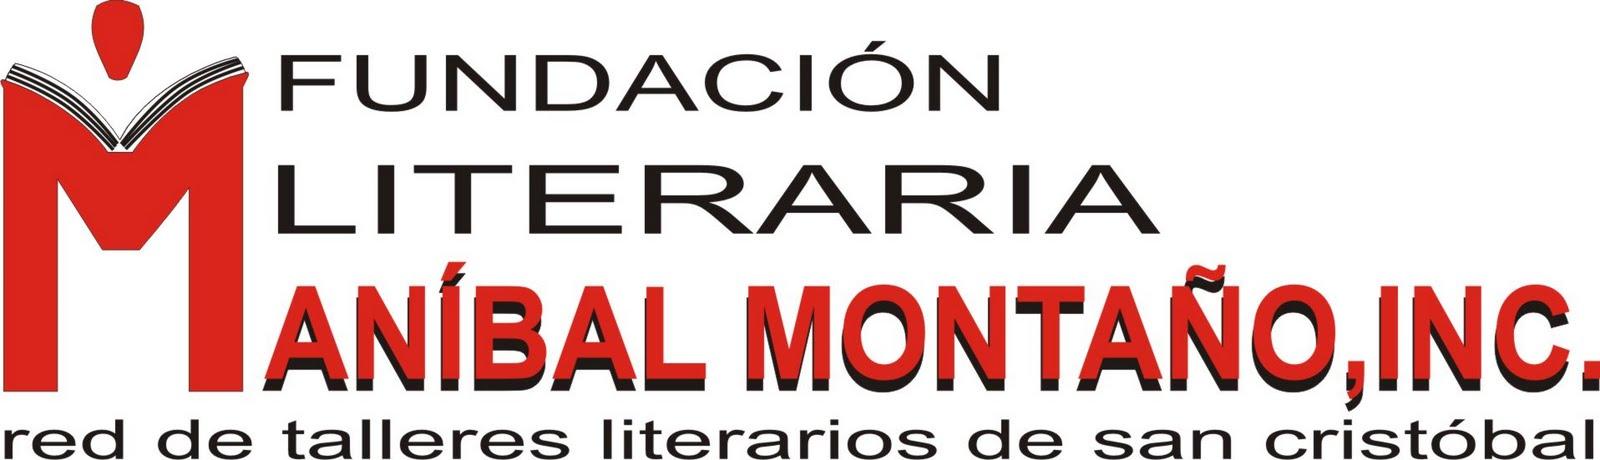 FUNDACION LITERARIA ANIBAL MONTAÑO